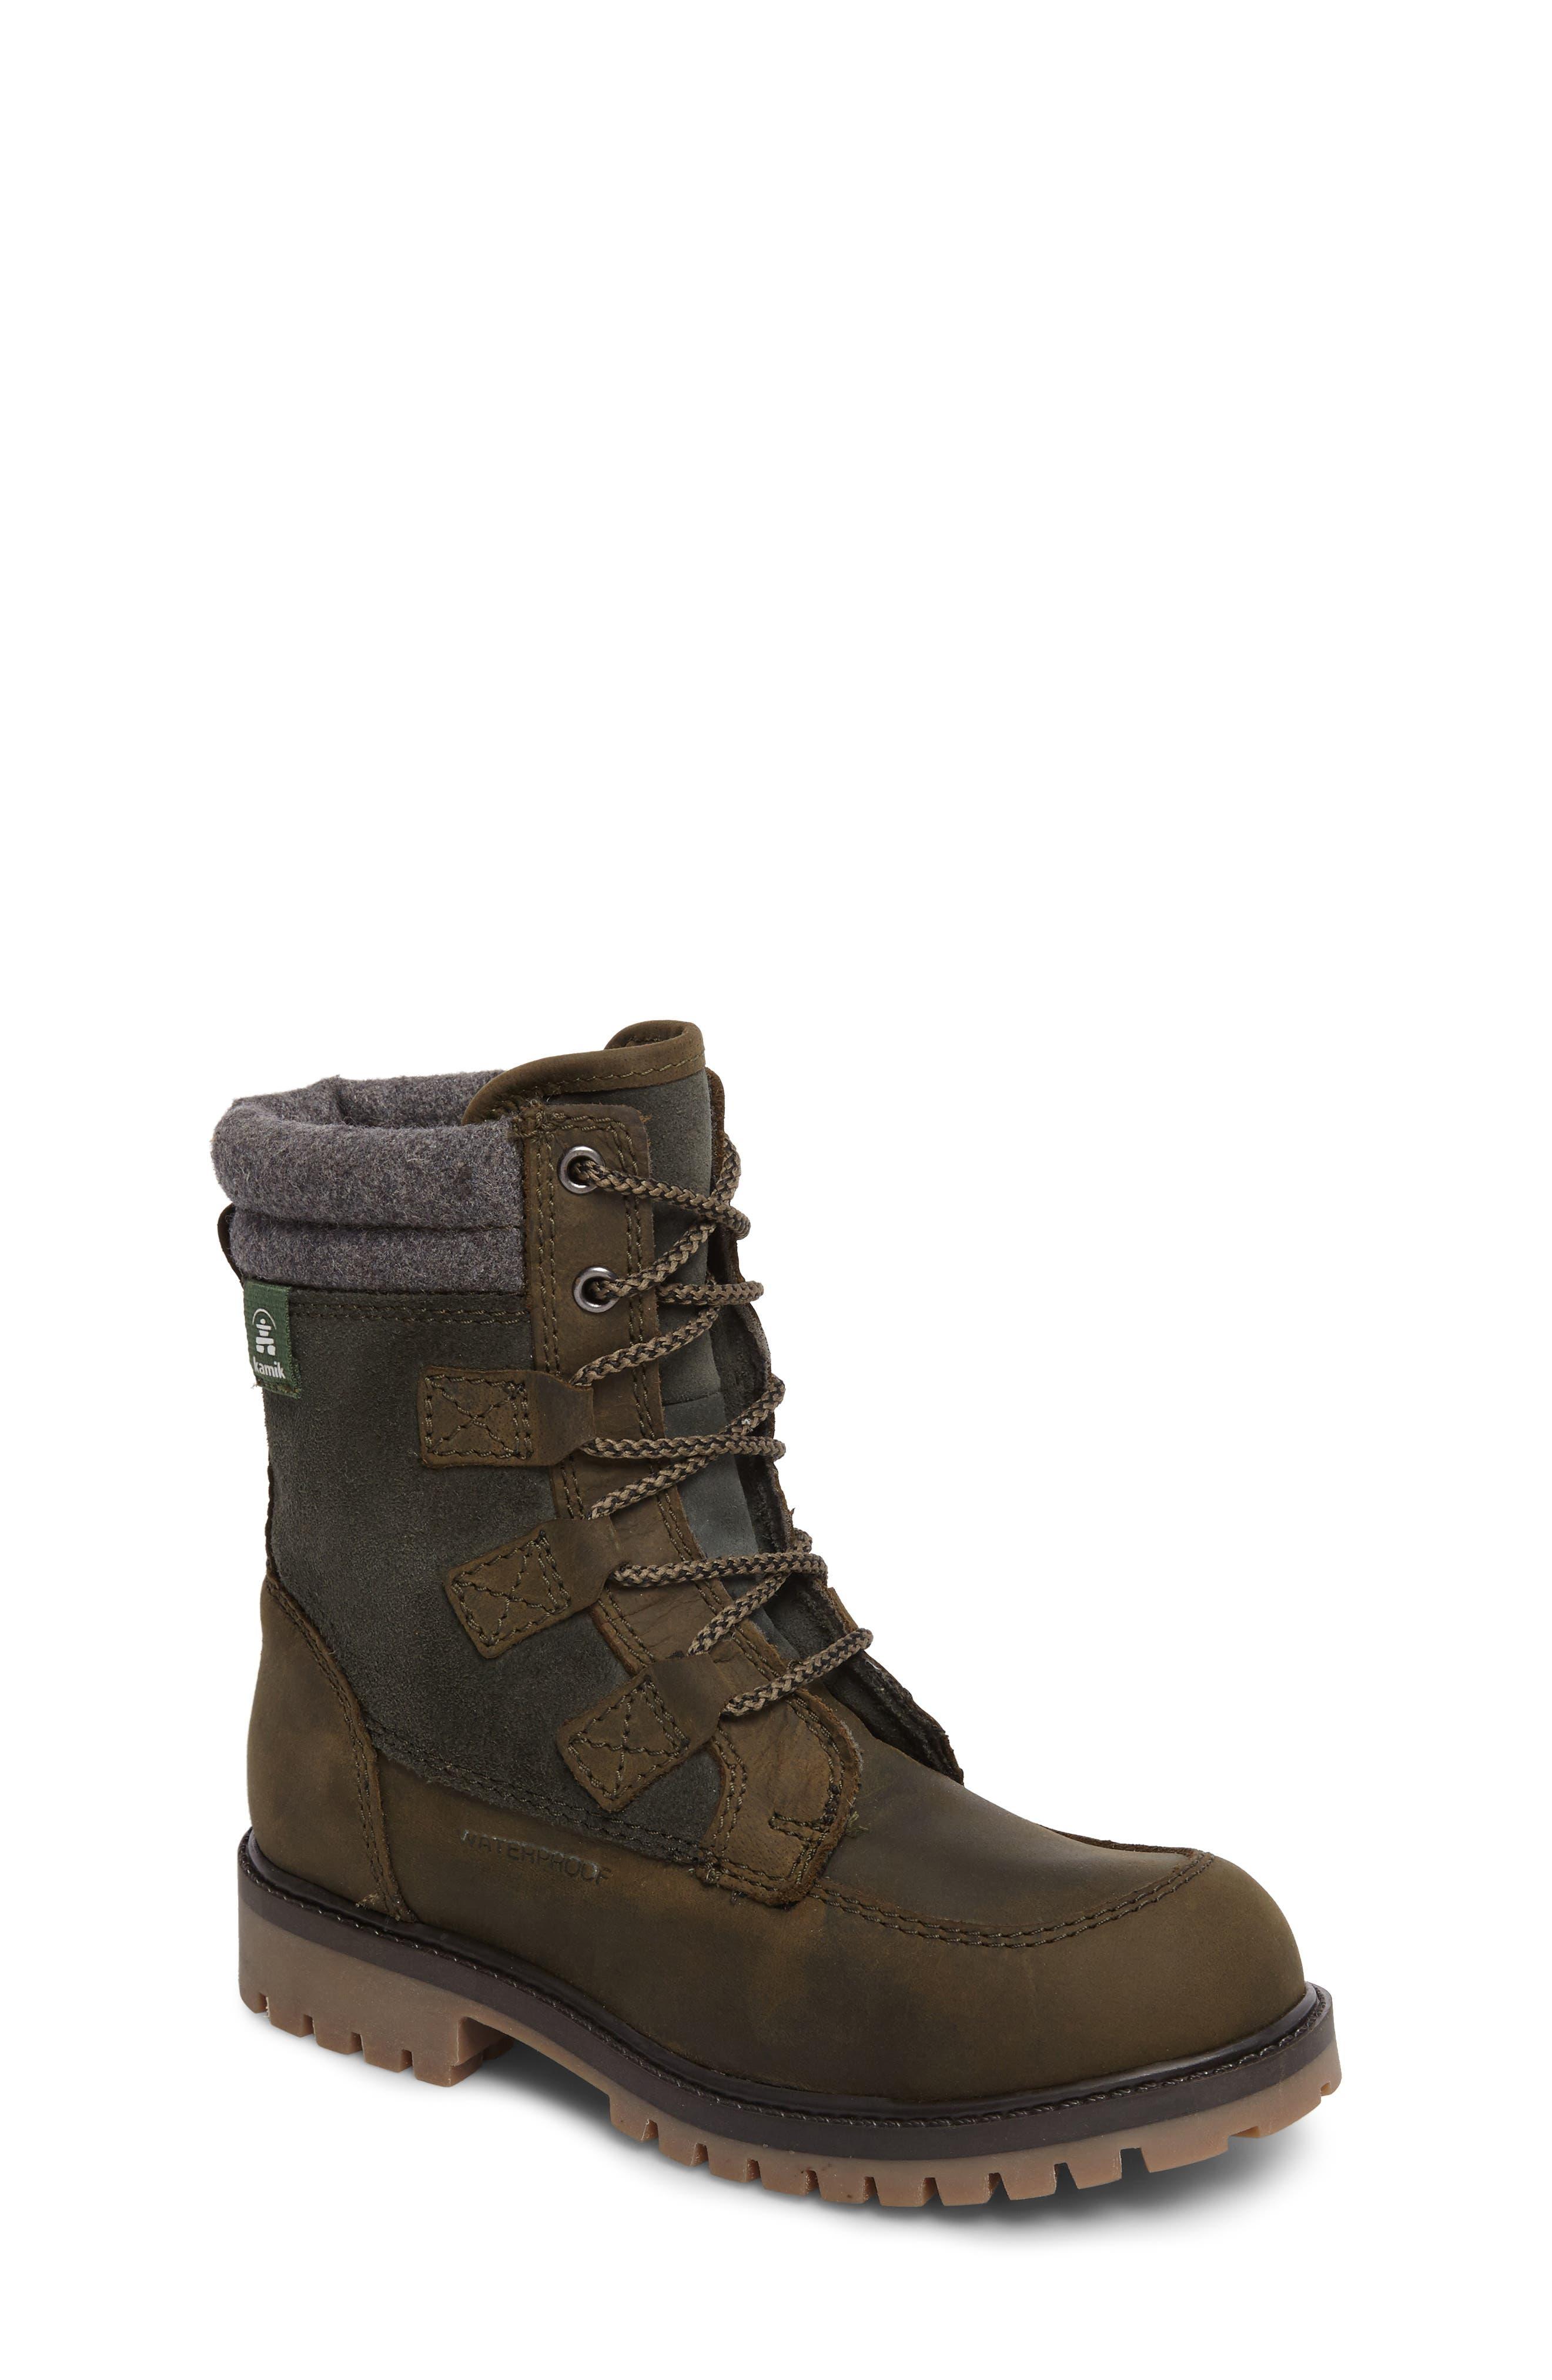 Takodalo Waterproof Boot,                         Main,                         color, Olive